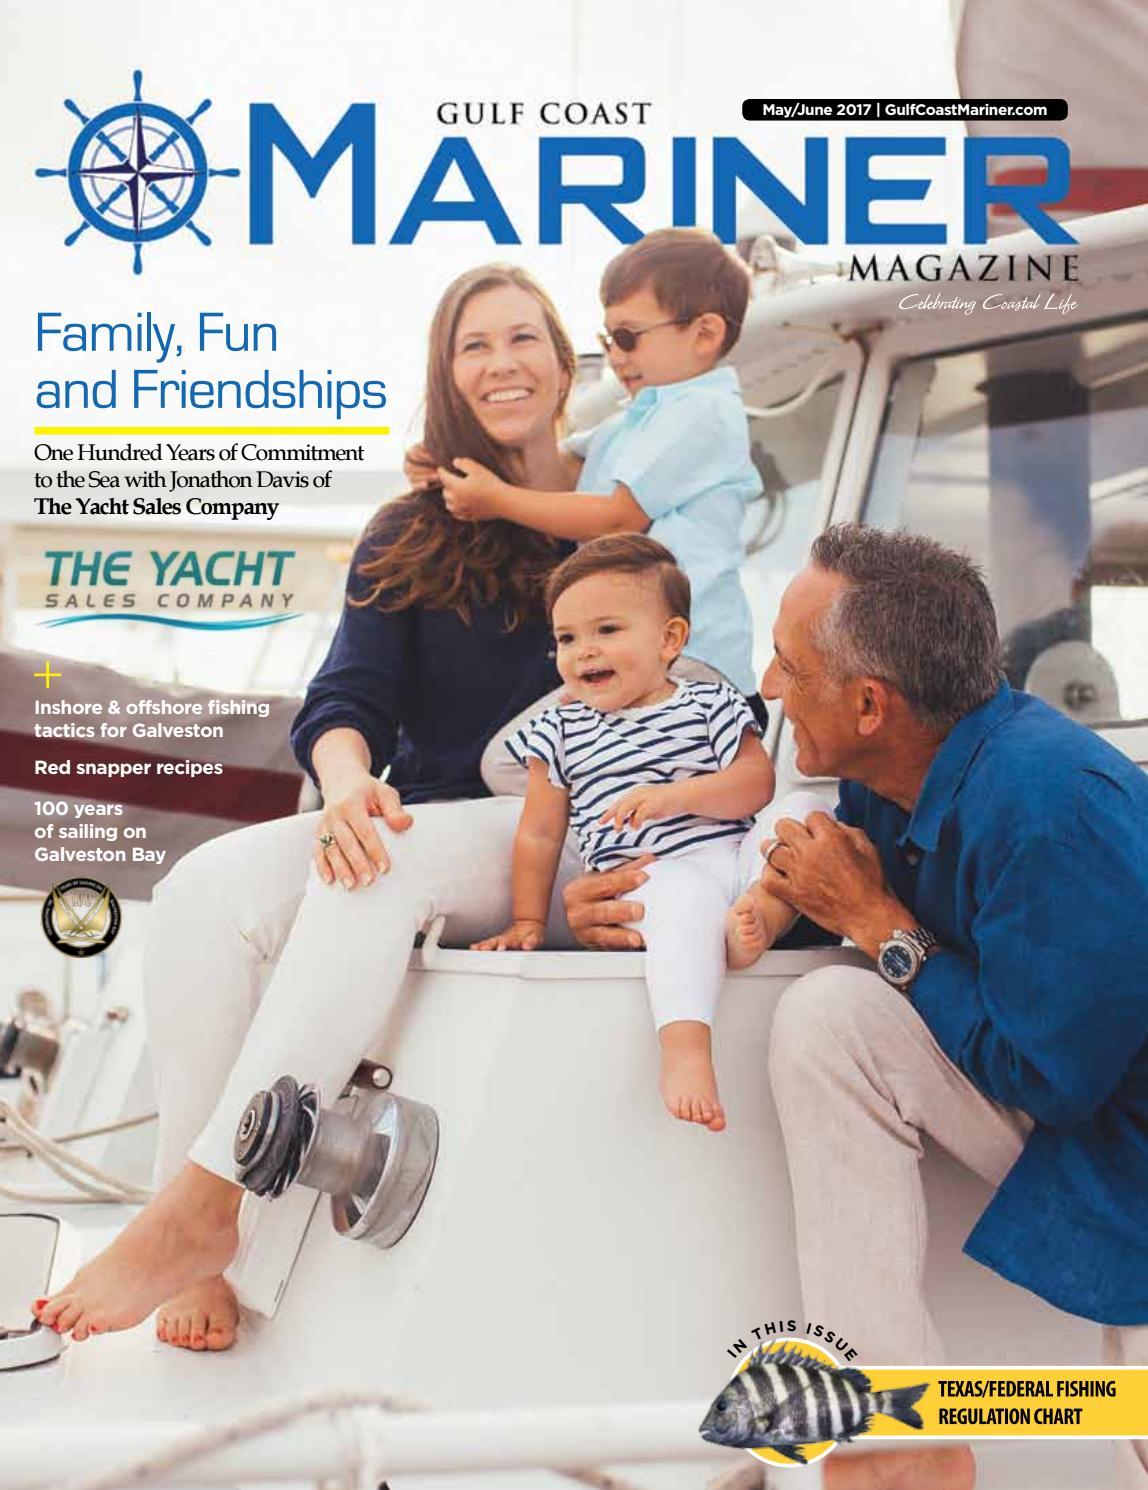 Gulf Coast Mariner Magazine May/June 2017 by Bay Group Media